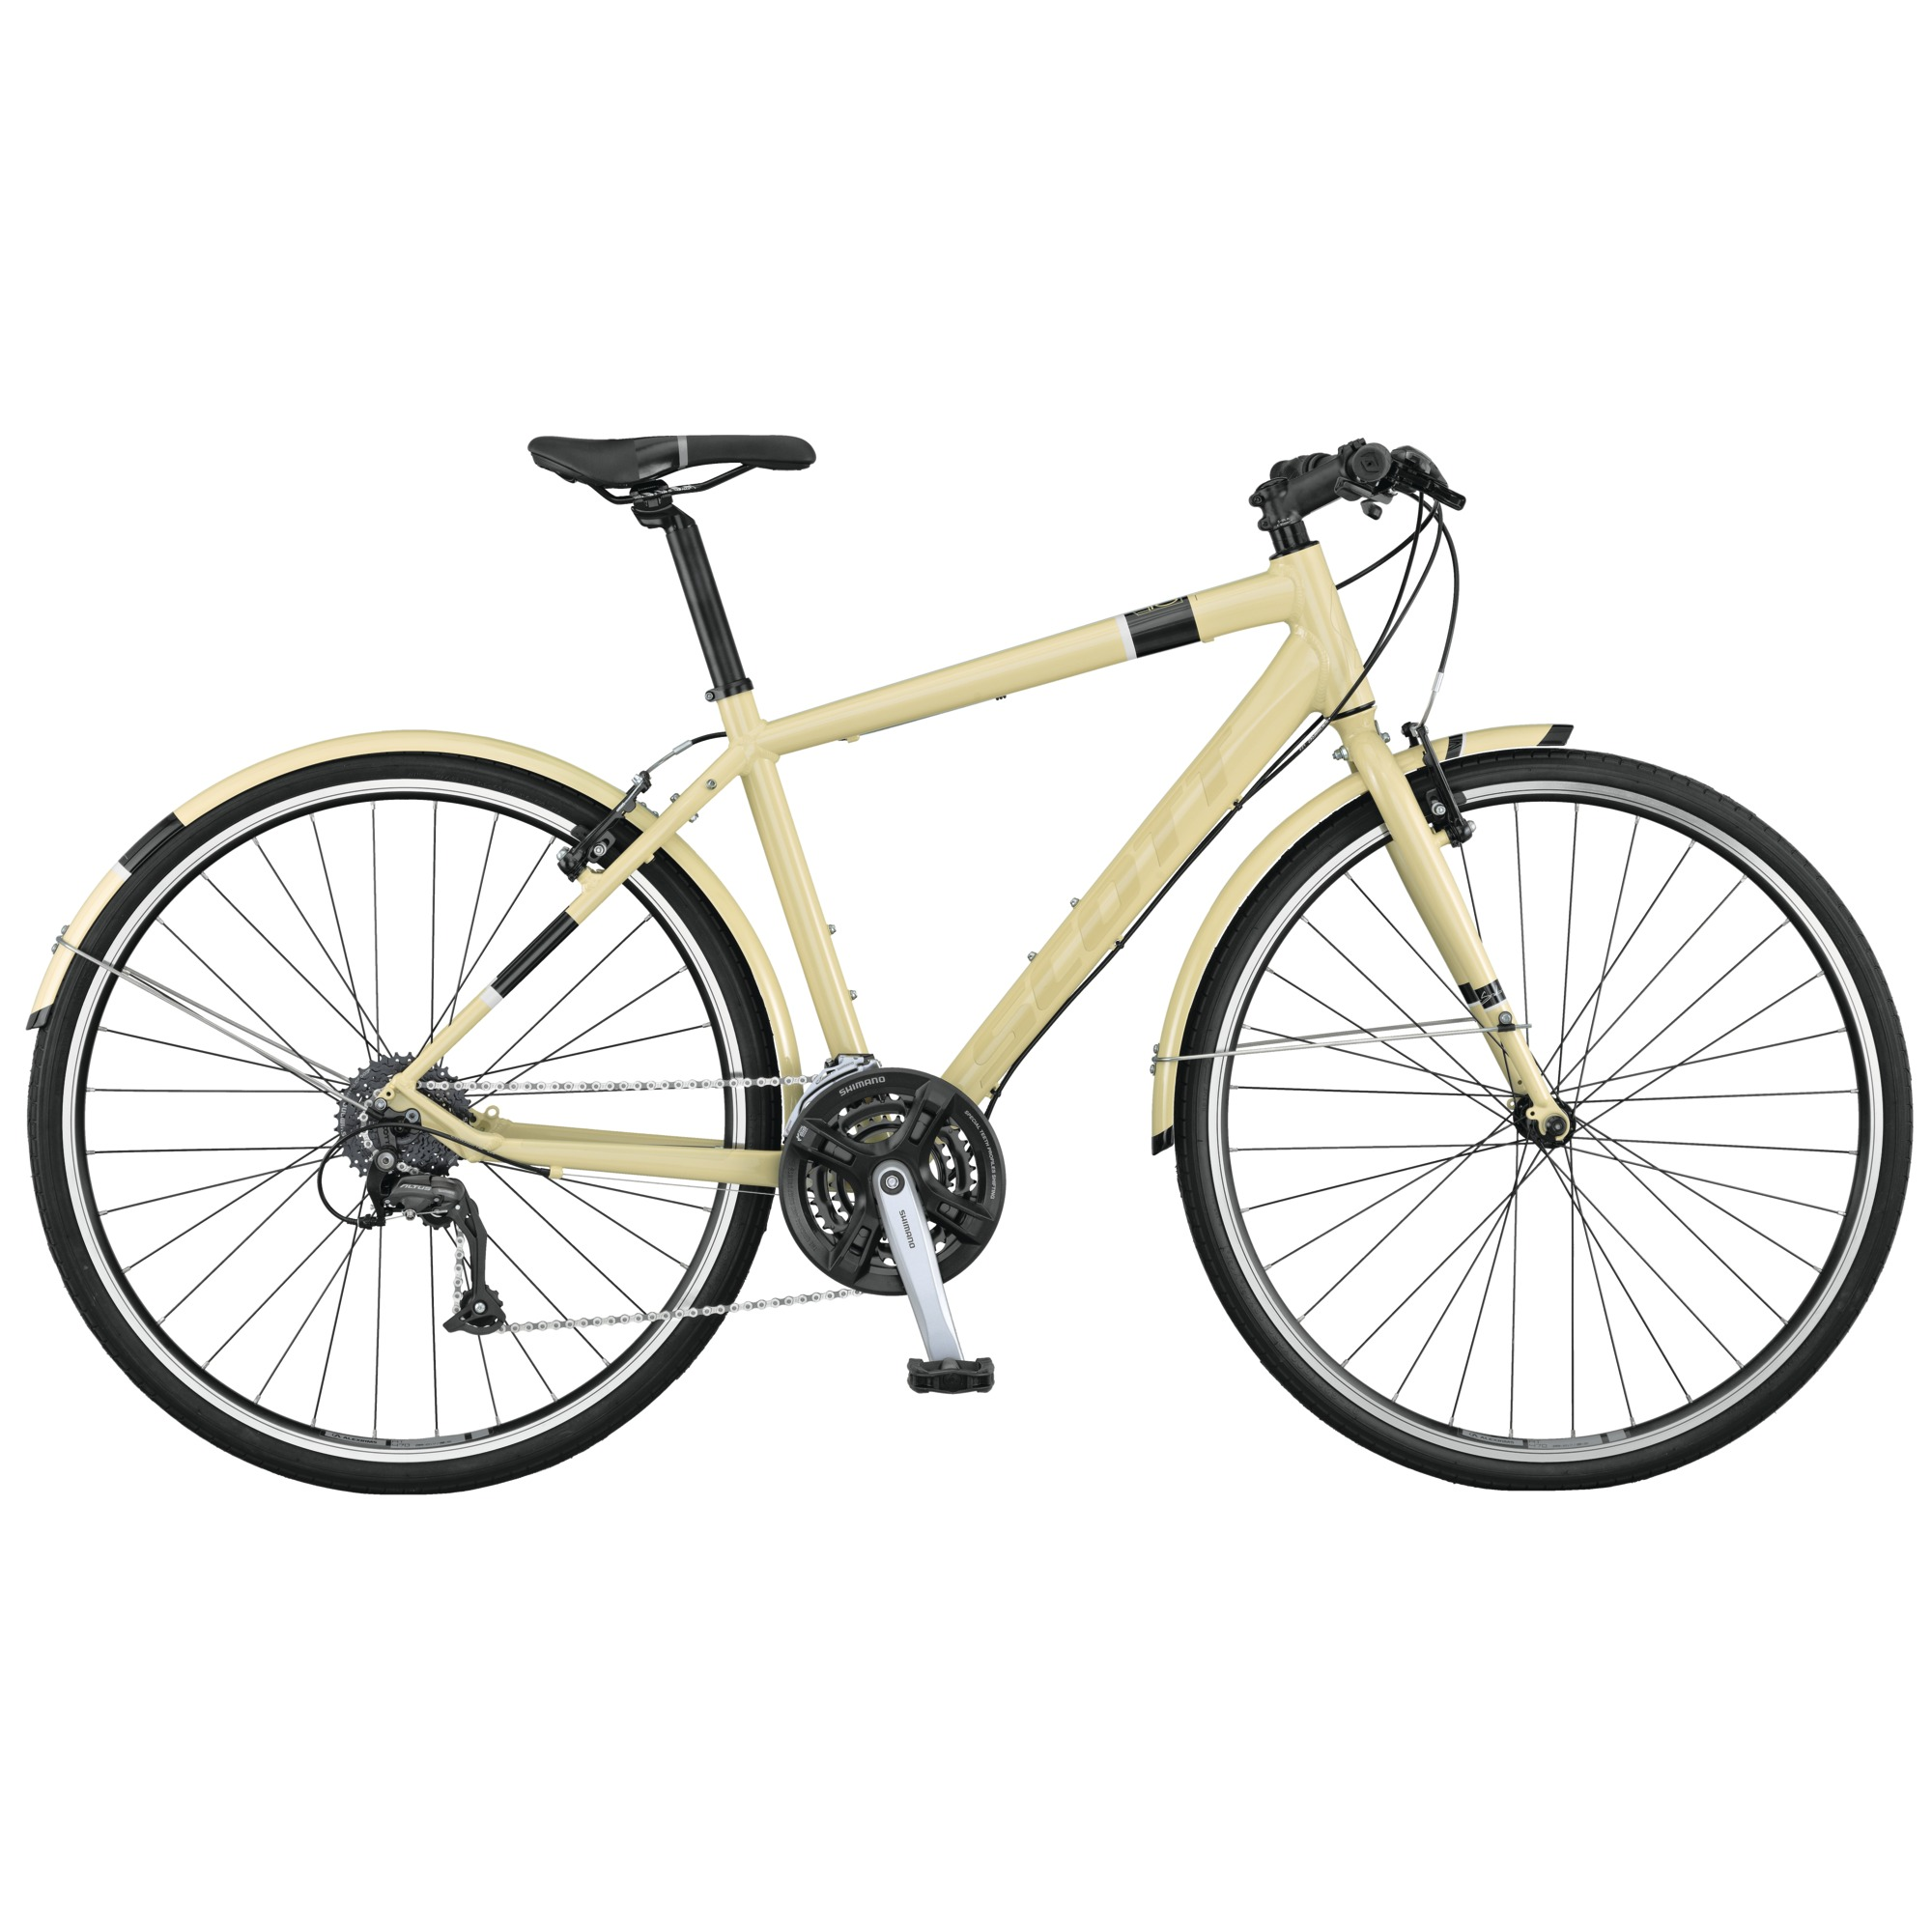 Liebe brief - Singlespeed fahrrad regensburg